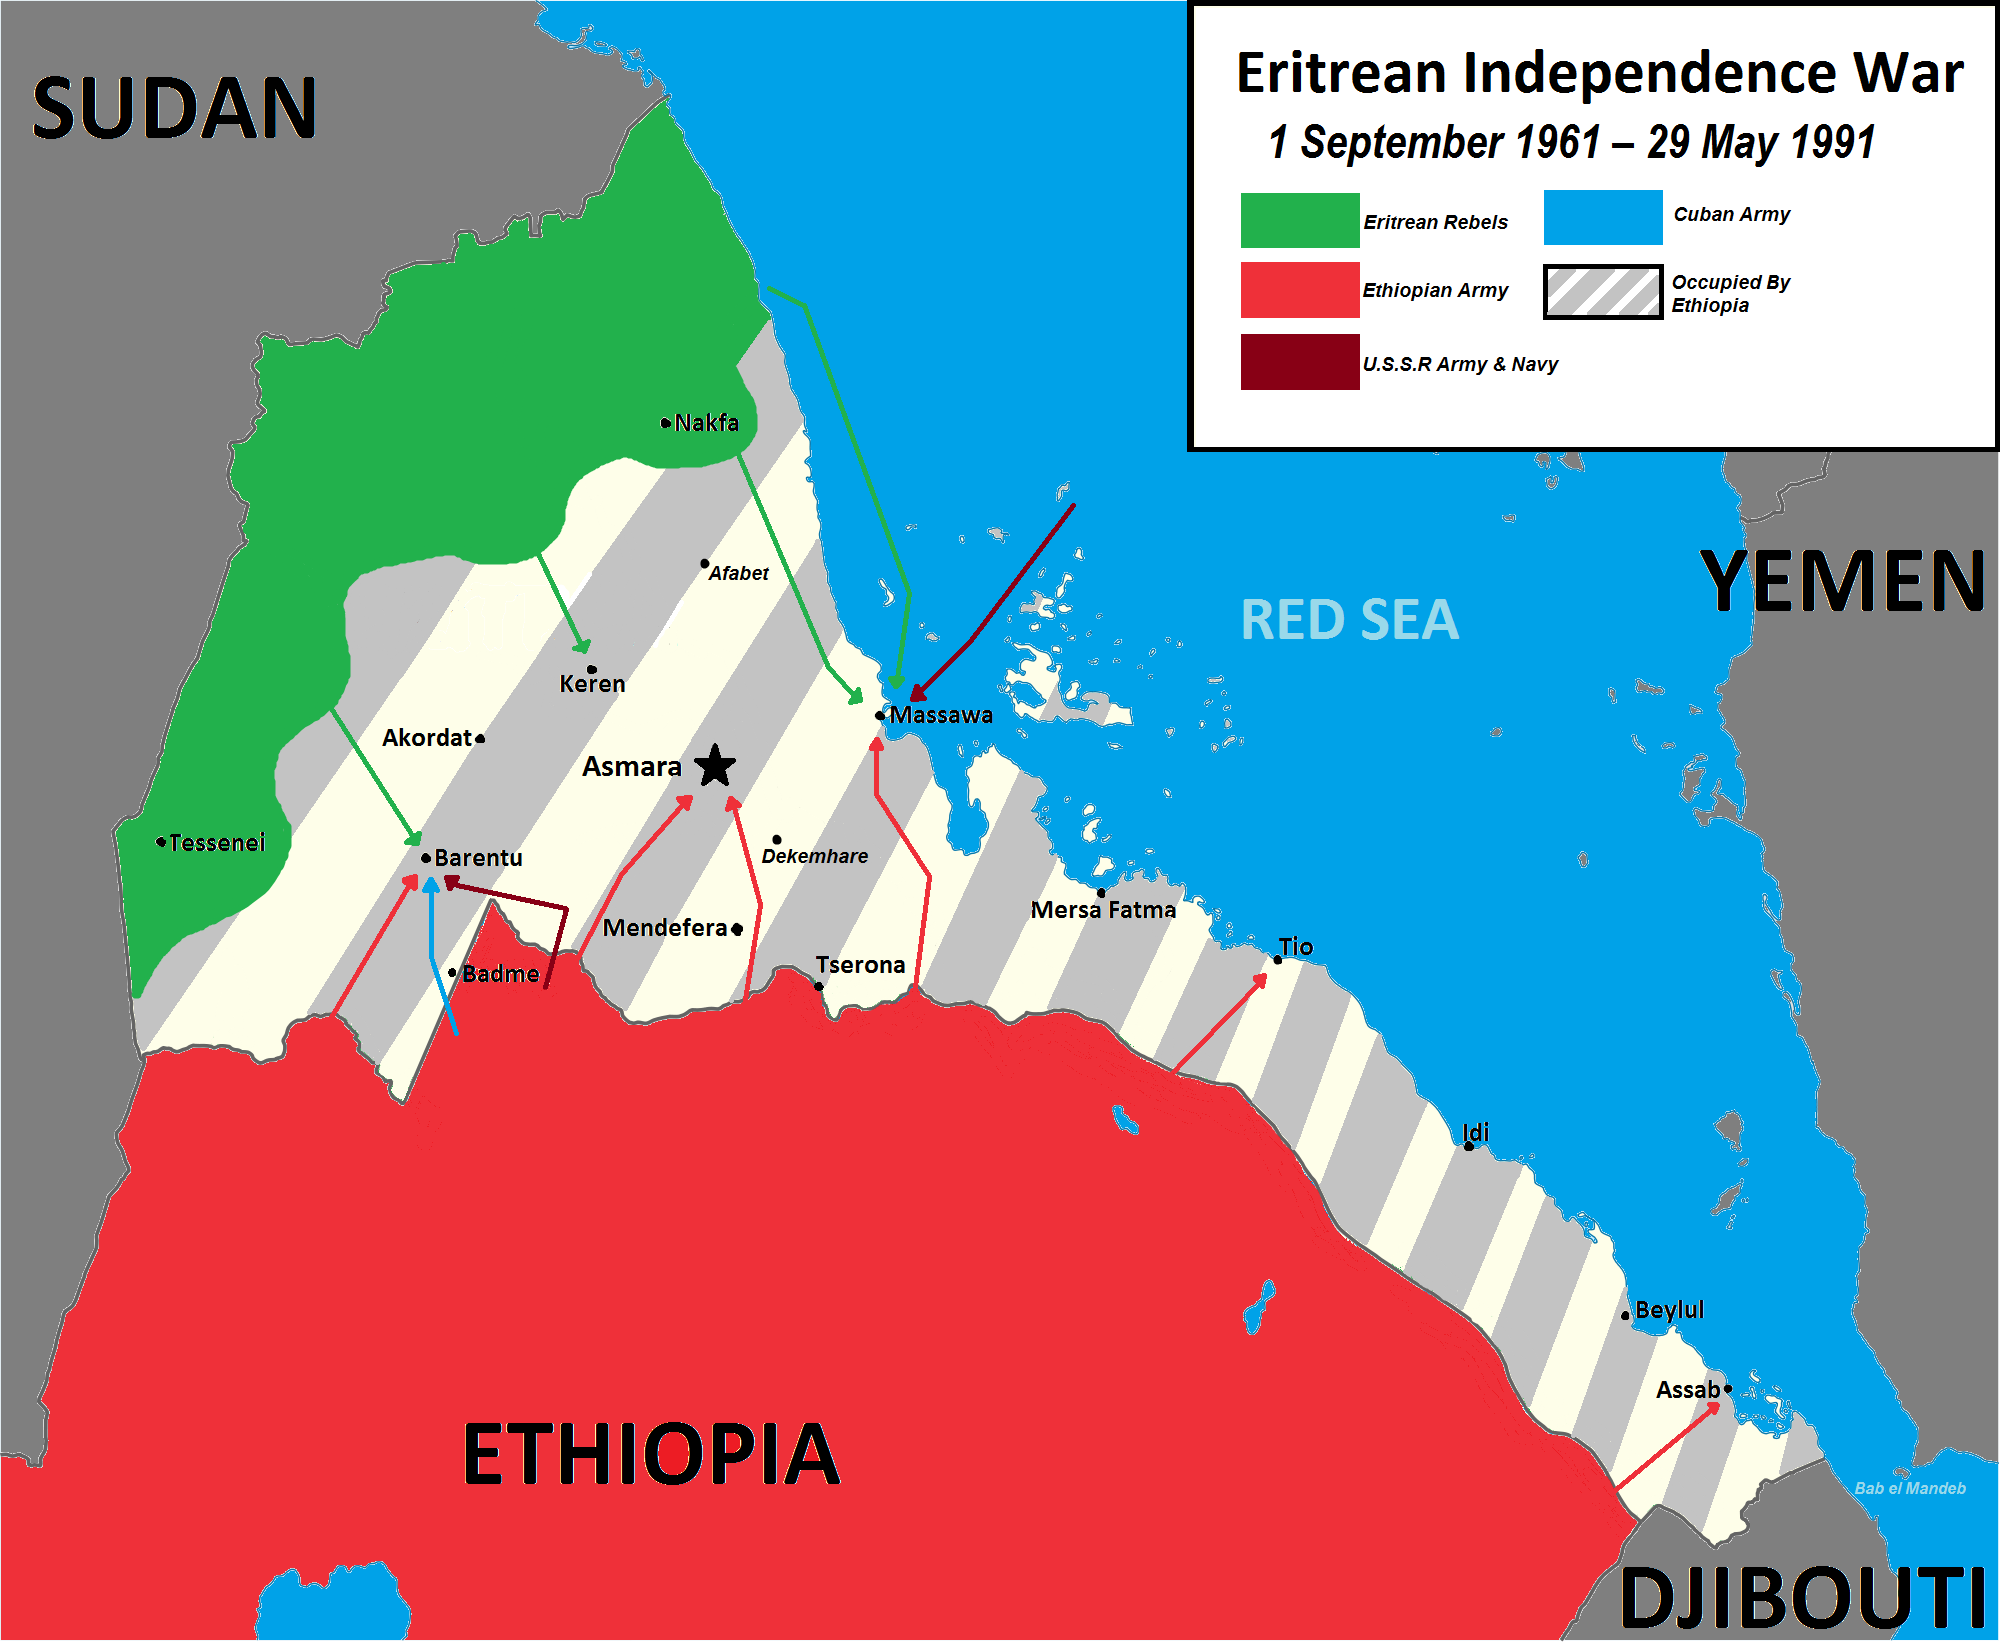 Eritrean War Of Independence Against Ethiopia 1961 1991 In 2020 Independence War Eritrean War